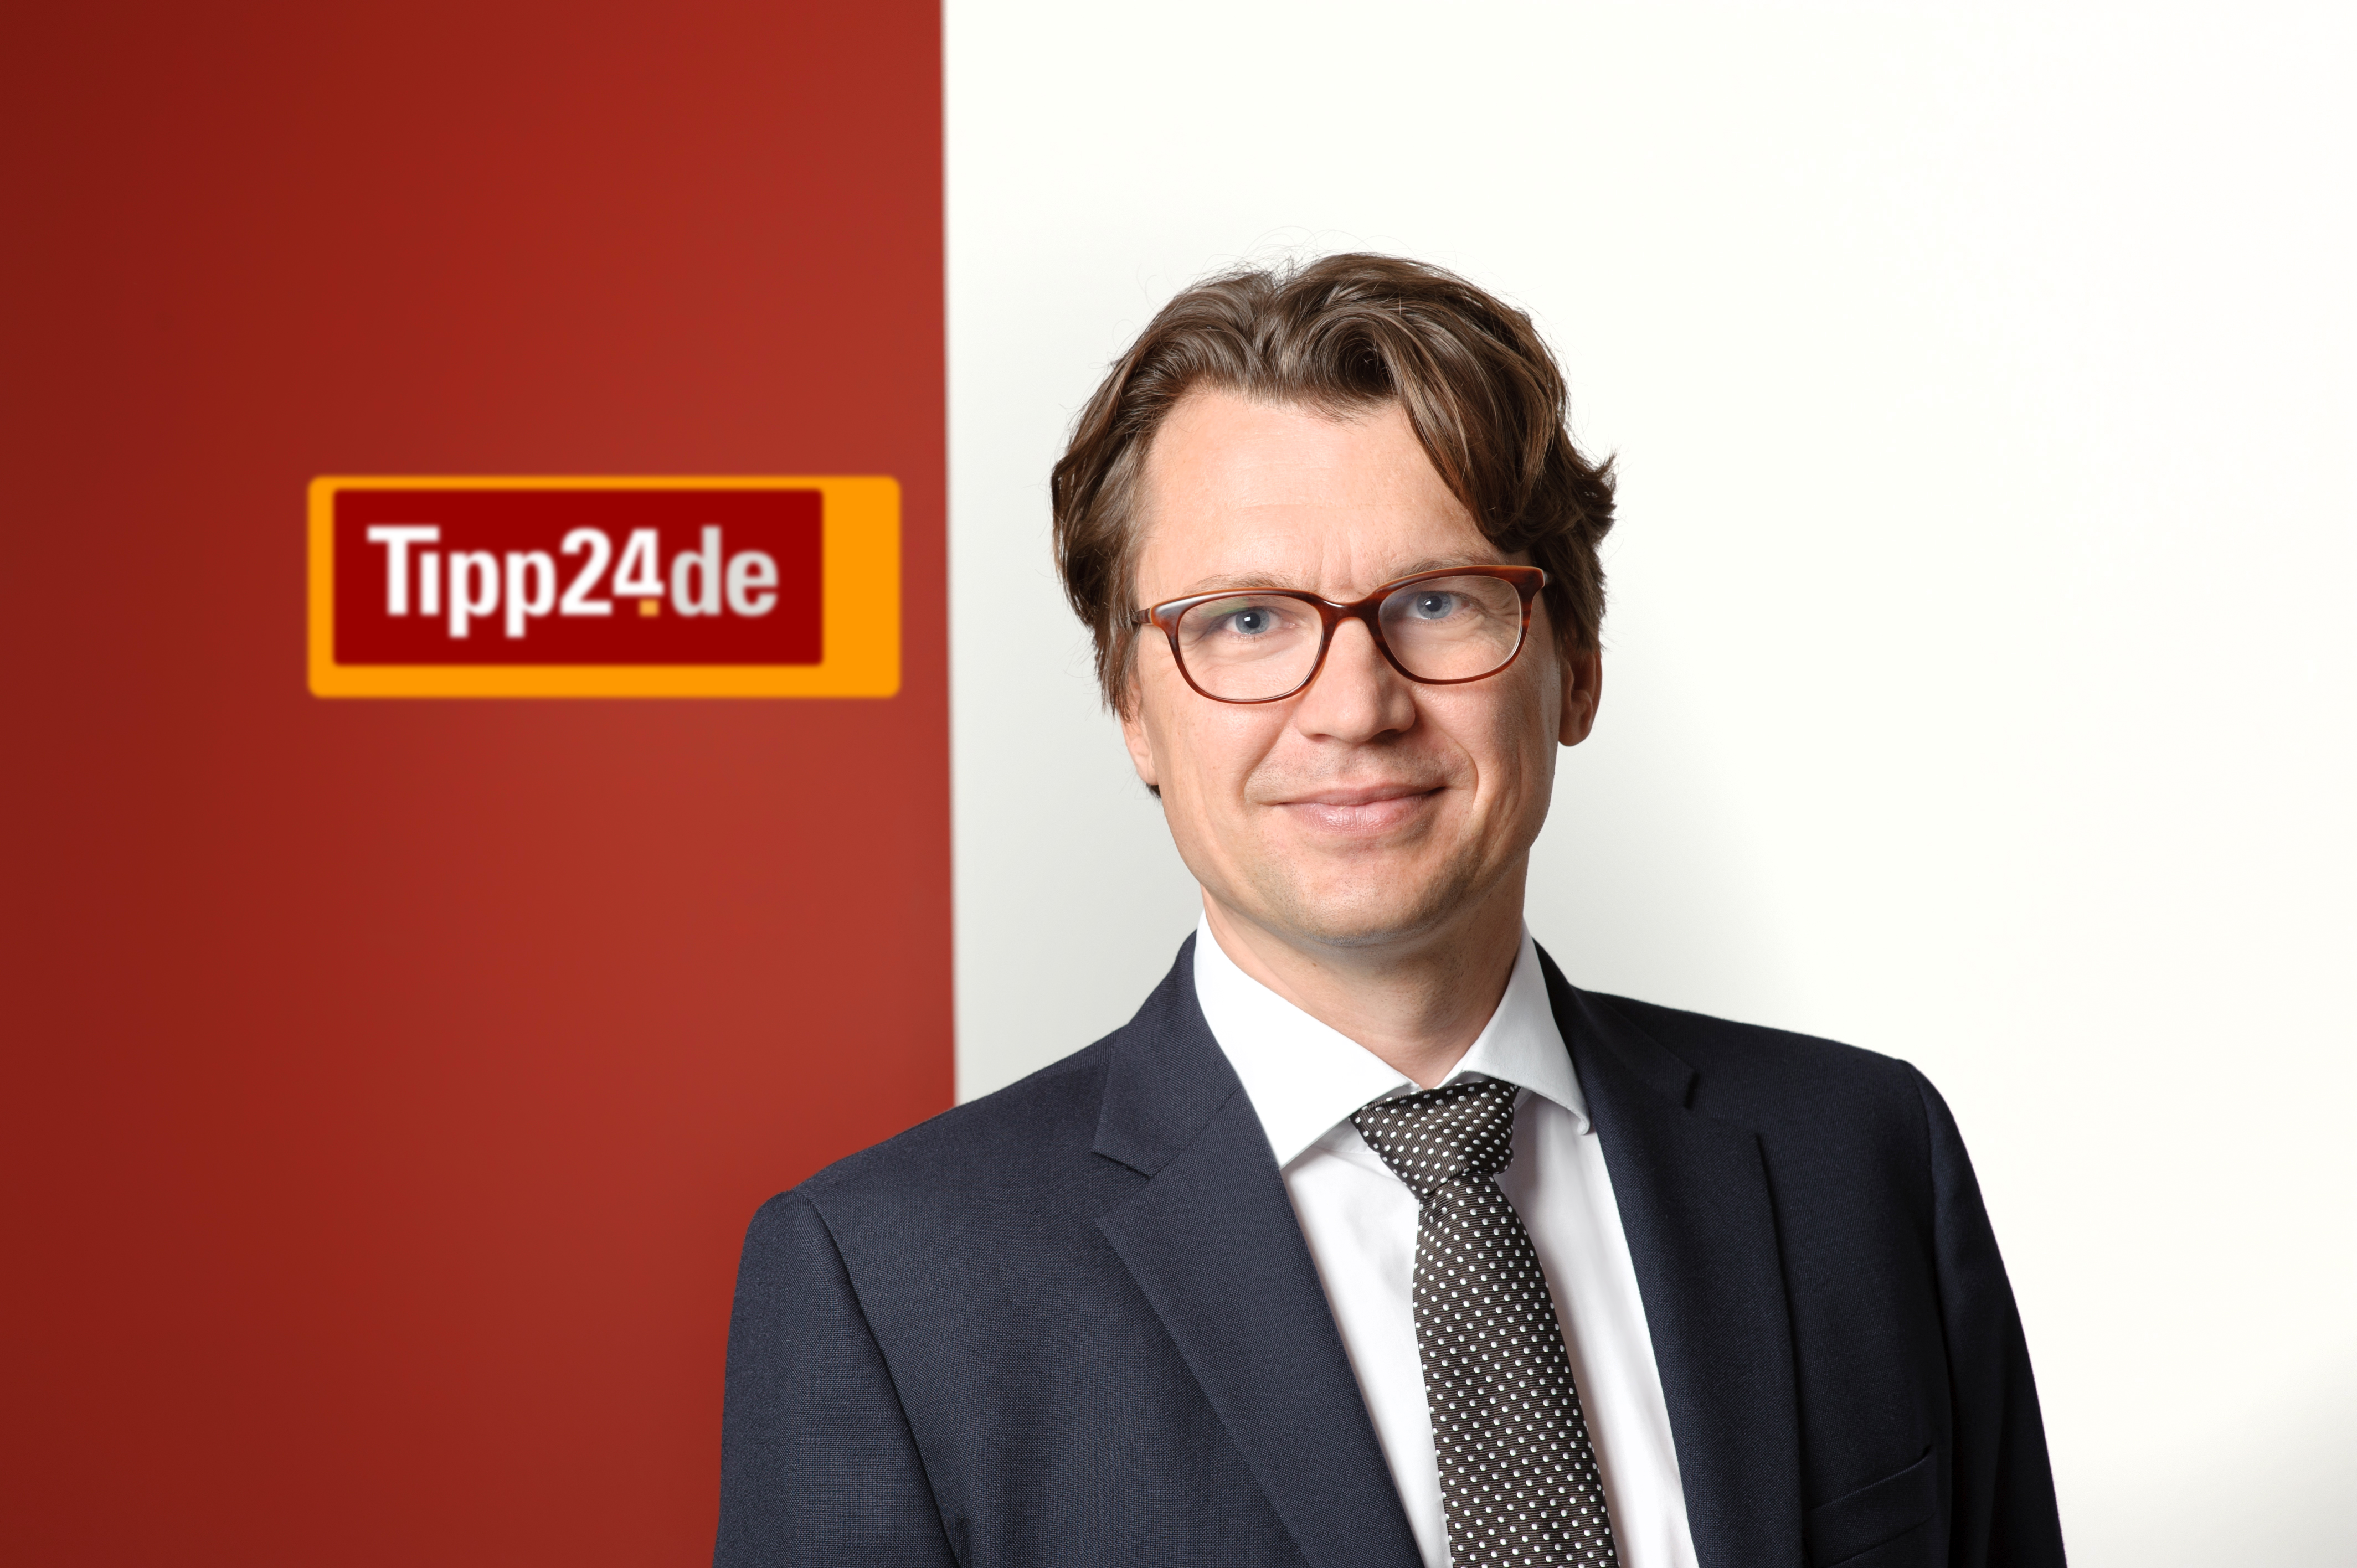 ttipp24